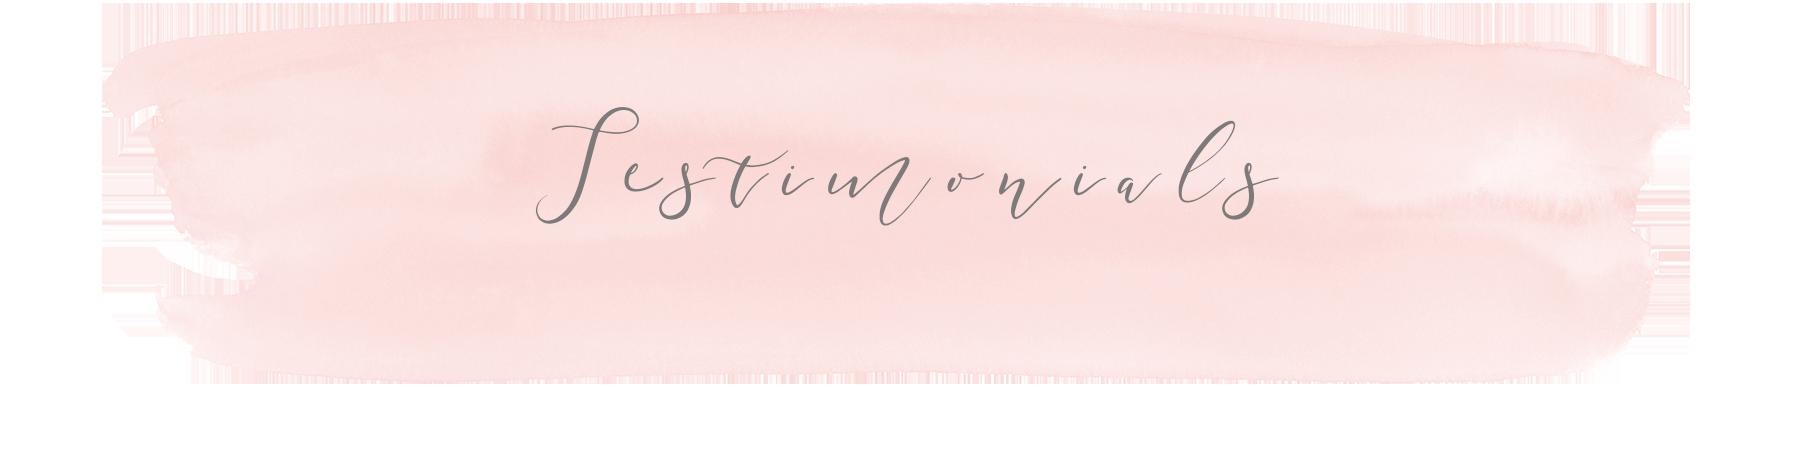 testimonials website pic.png